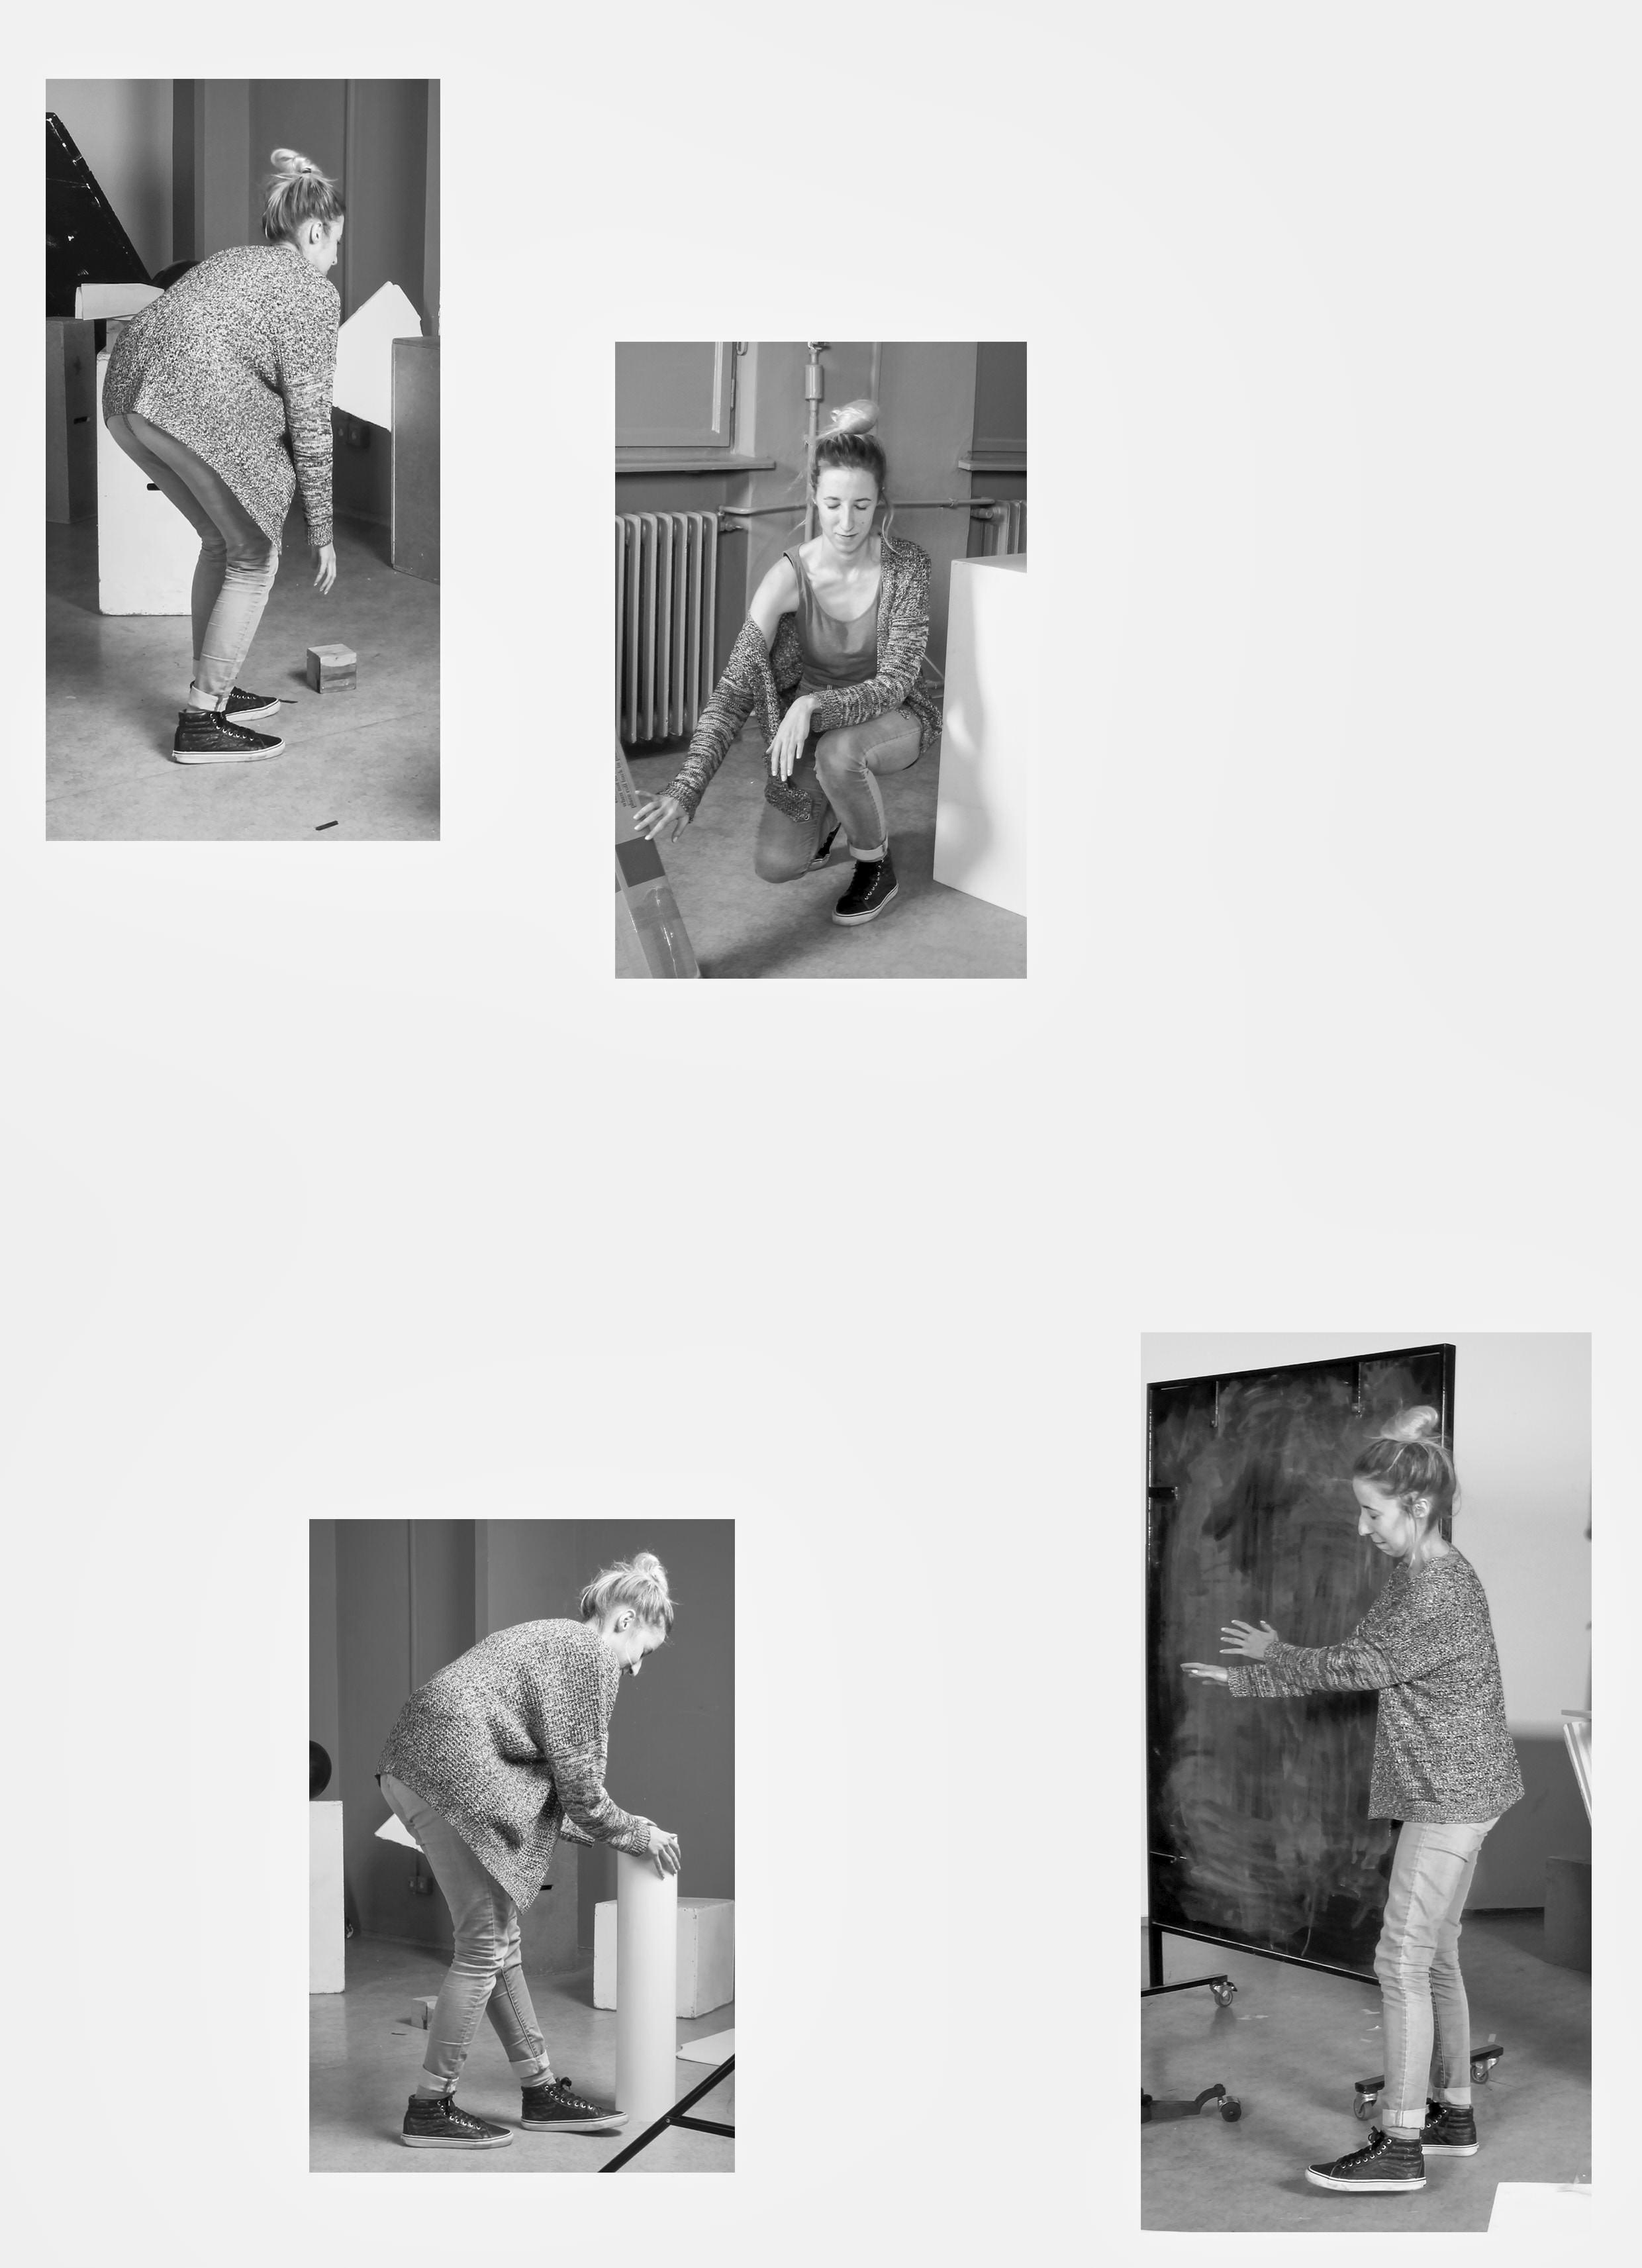 Bilak Krystyna: Unseen Study Photobook Detail © Bilak Krystyna